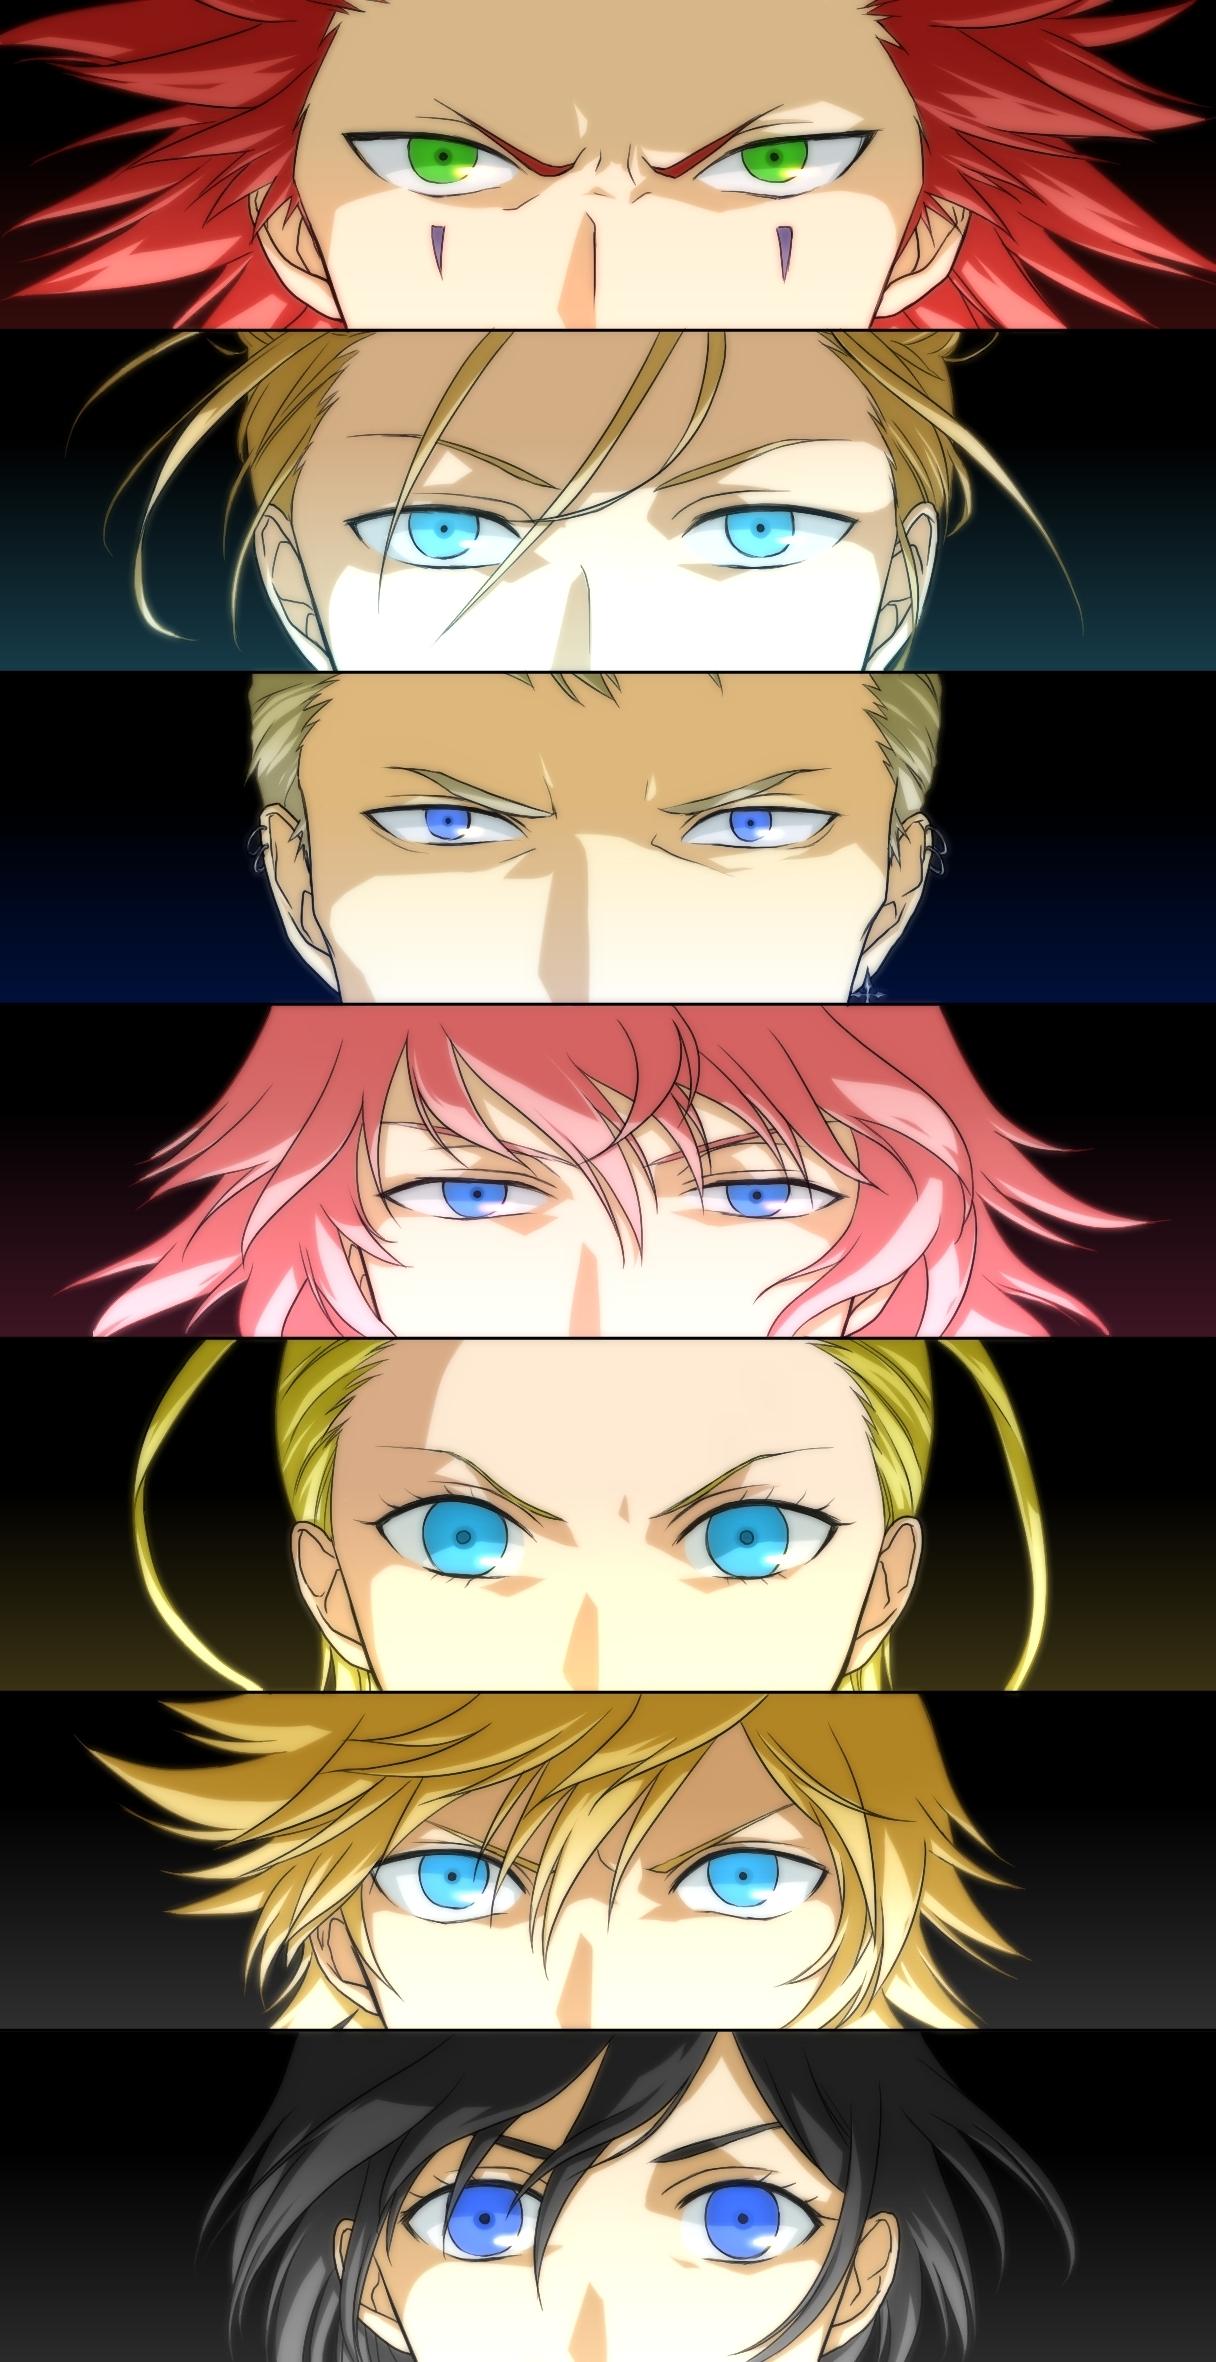 Anime Characters Named Zero : Organization xiii kingdom hearts ii image